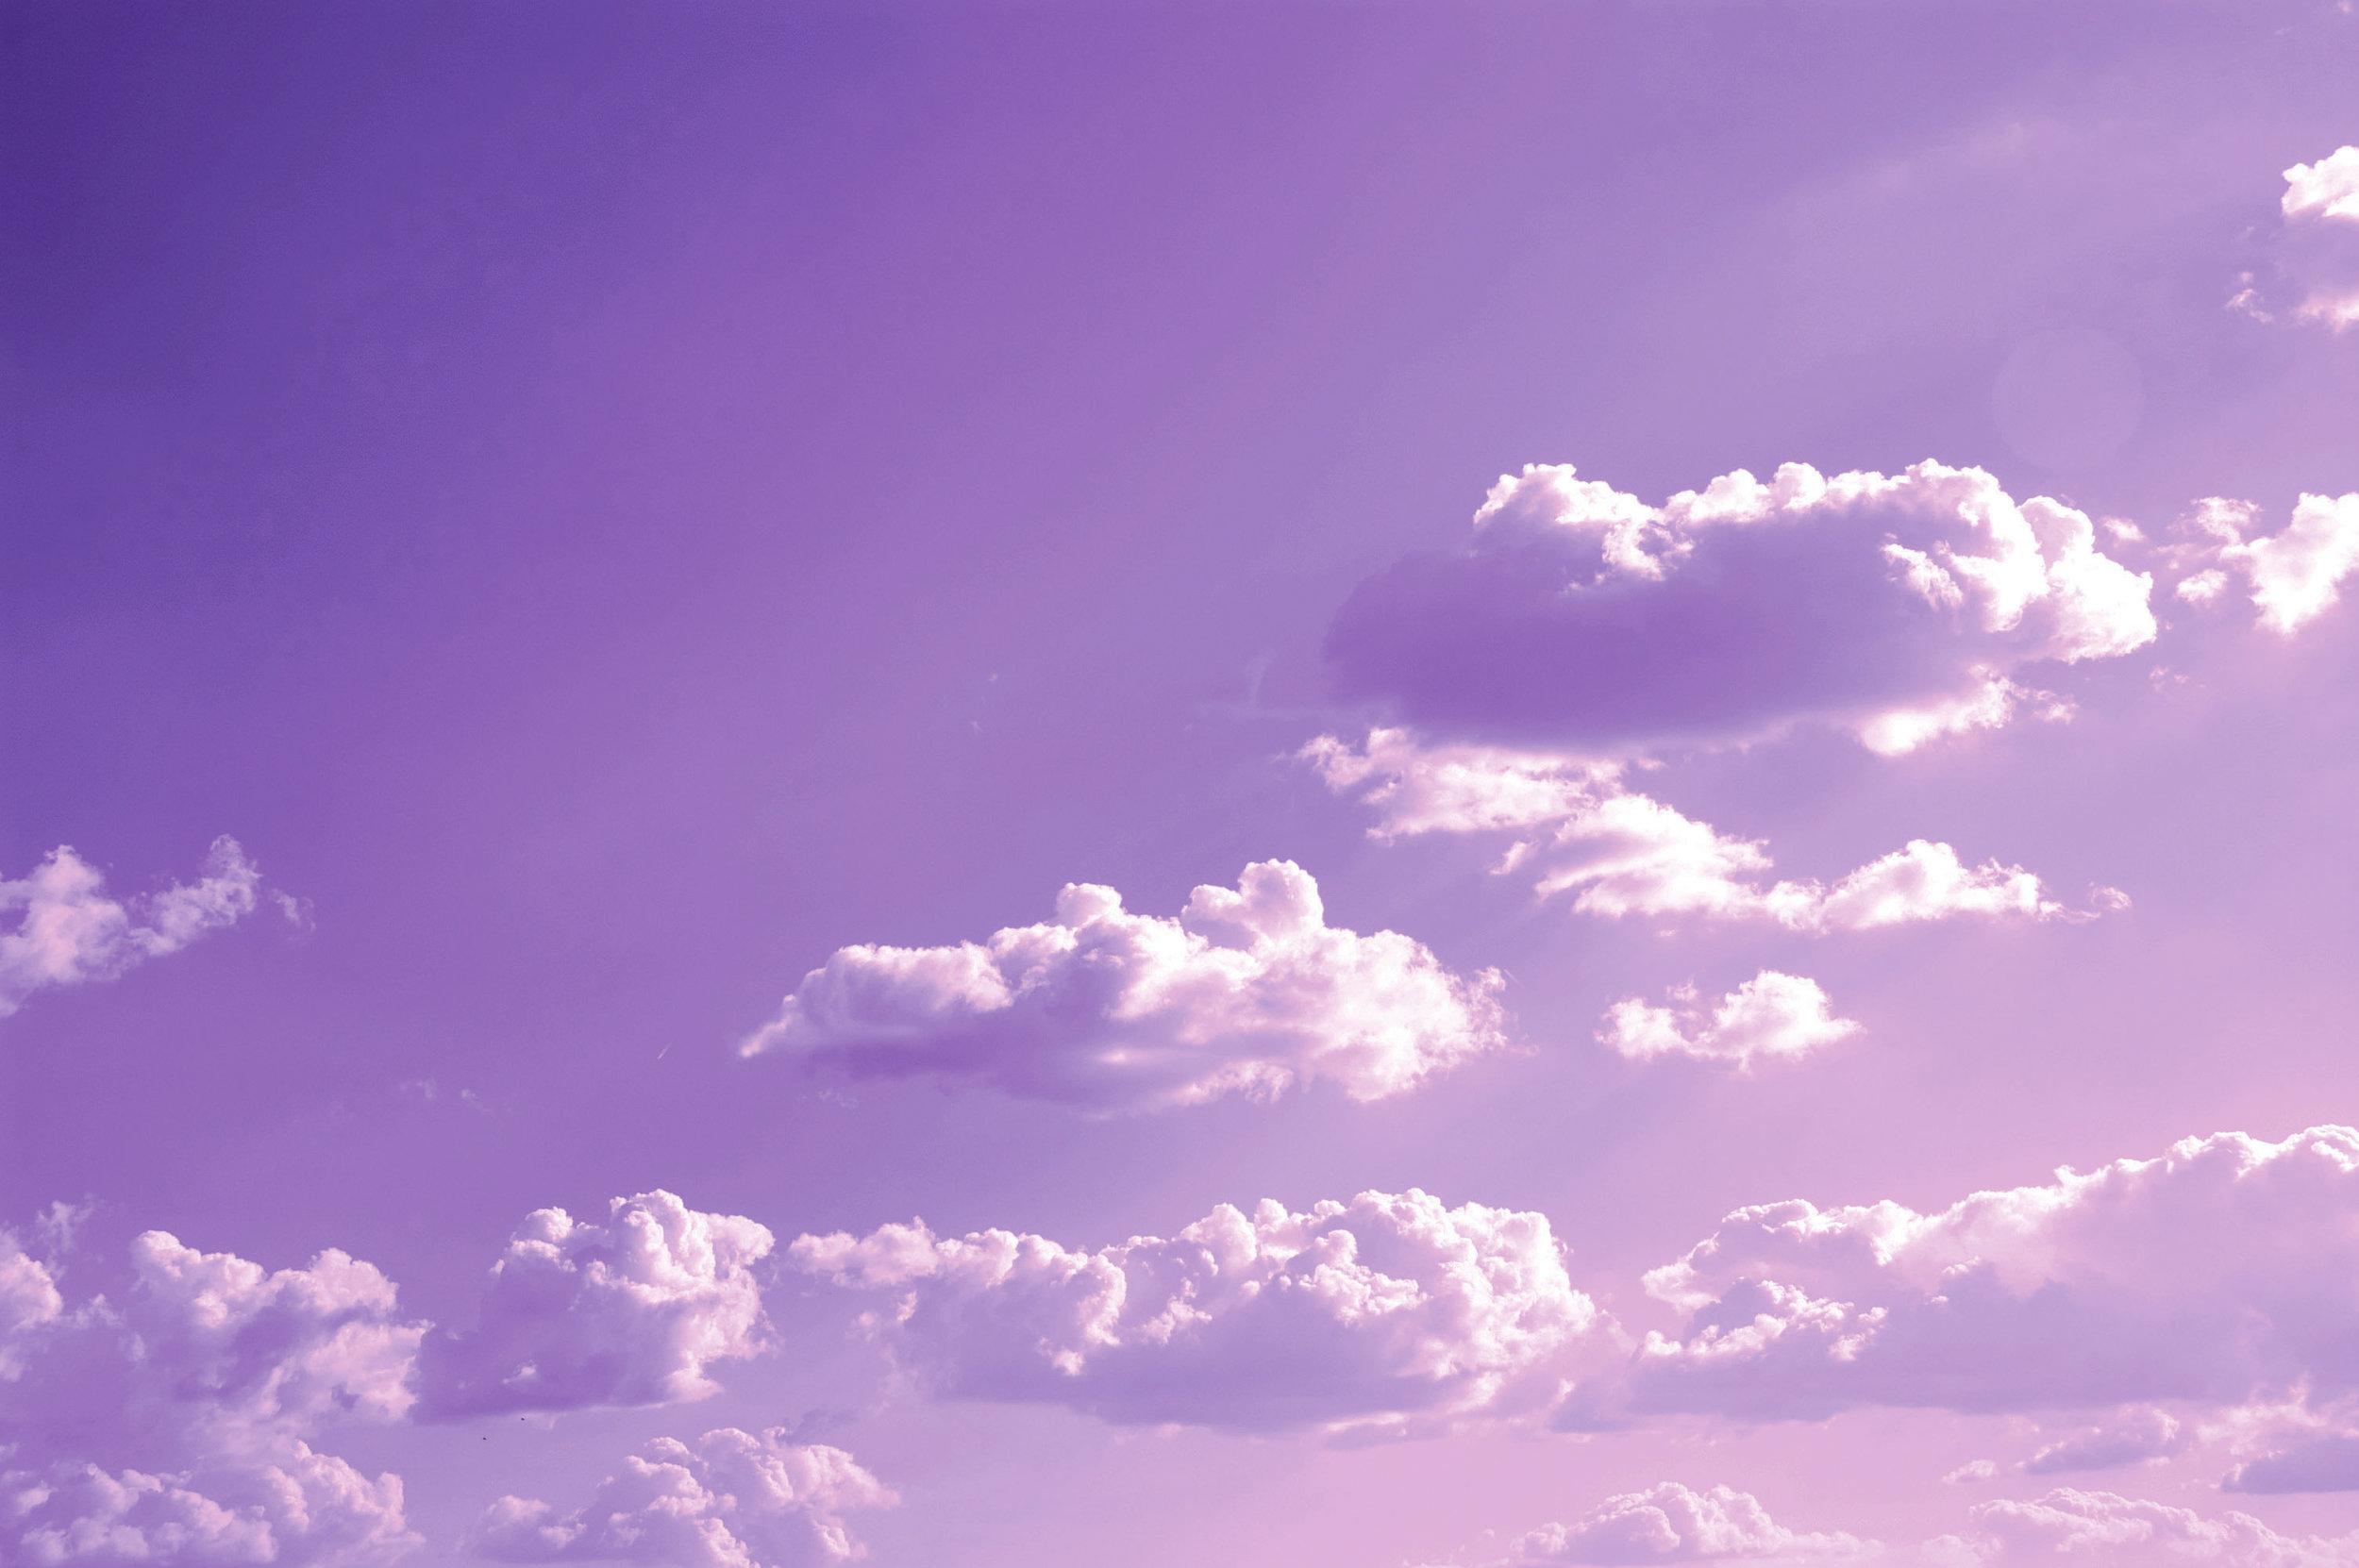 NUage-violet-fond.jpg